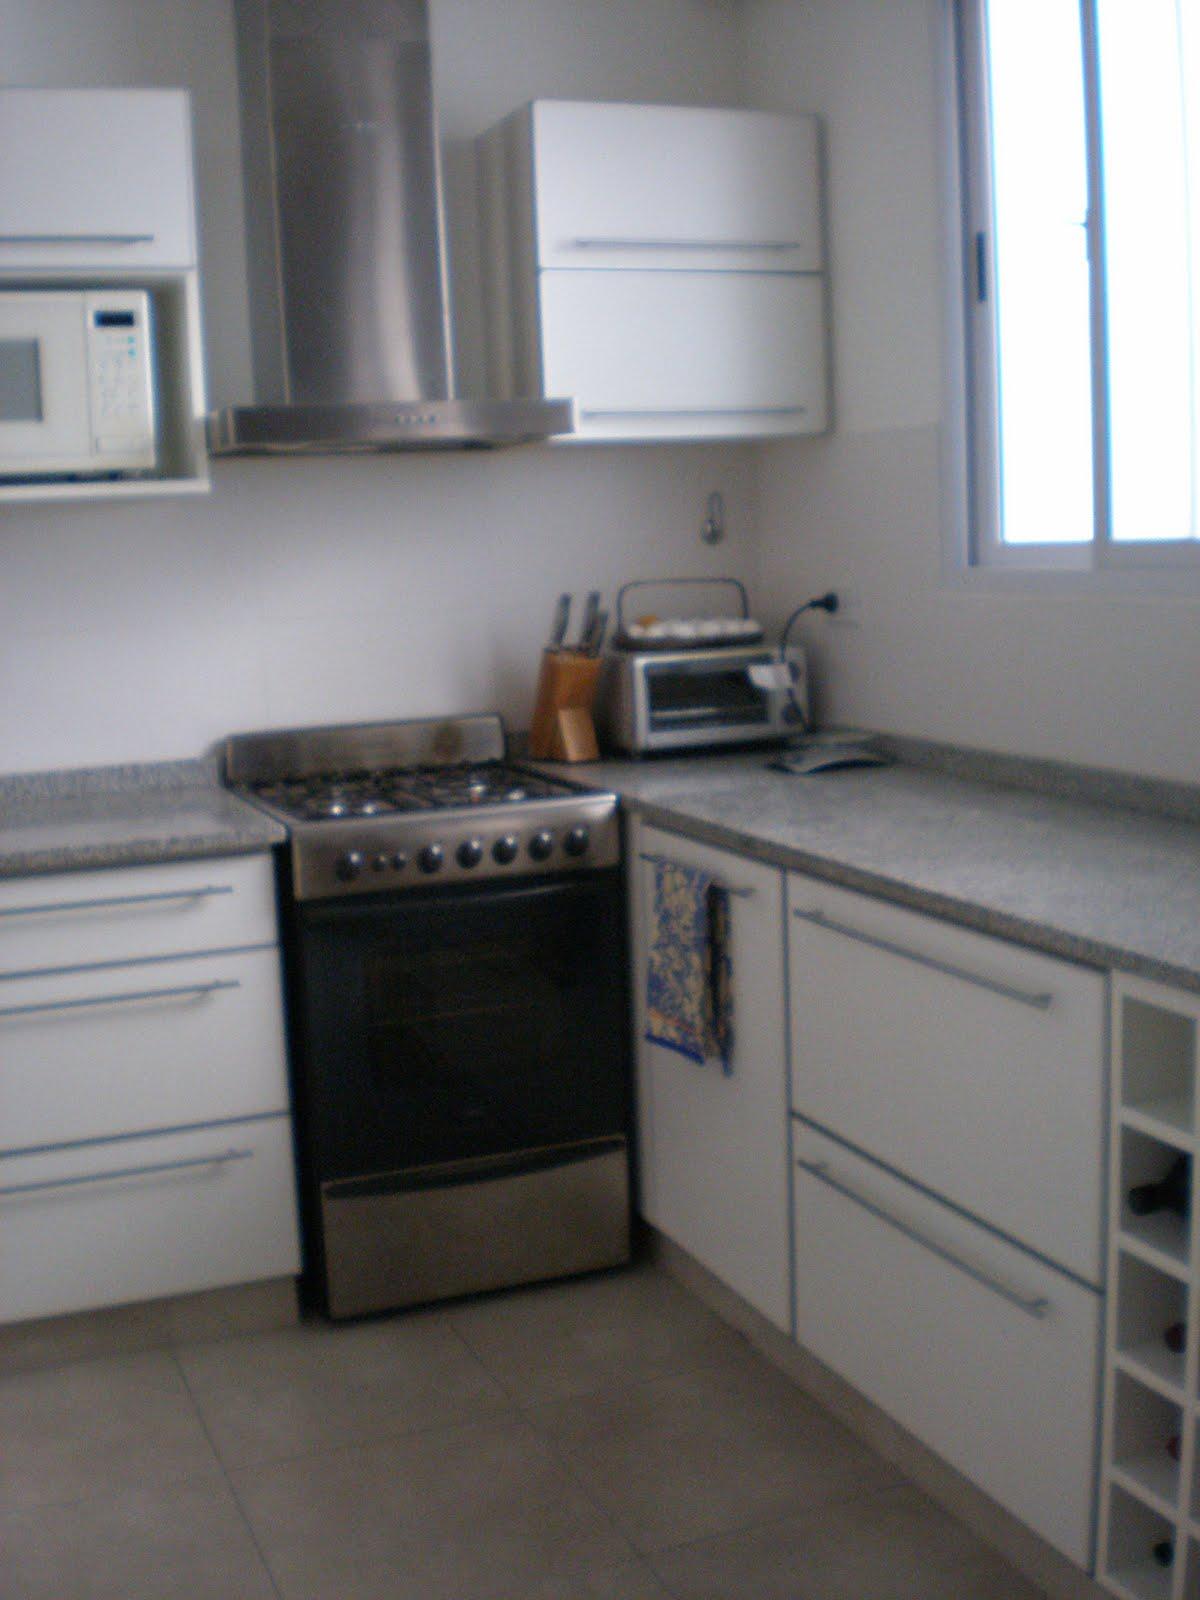 Perfiles De Aluminio Para Muebles De Cocina : Huara muebles de cocina con perfiles aluminio